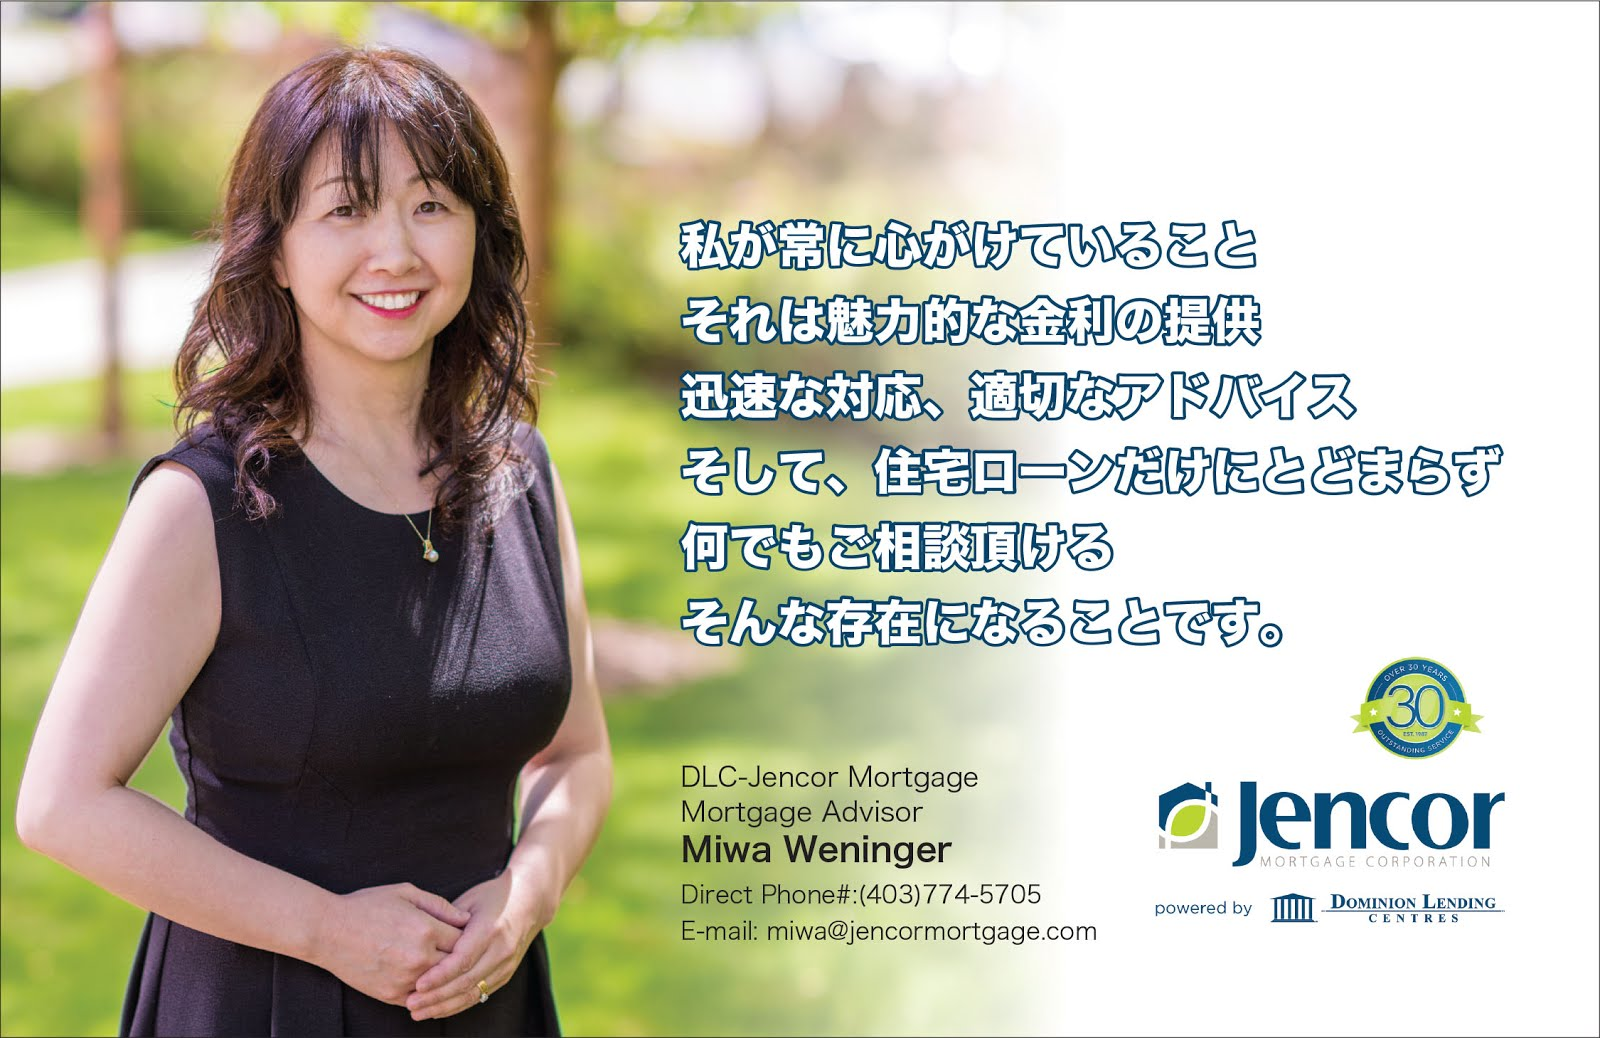 Jencor